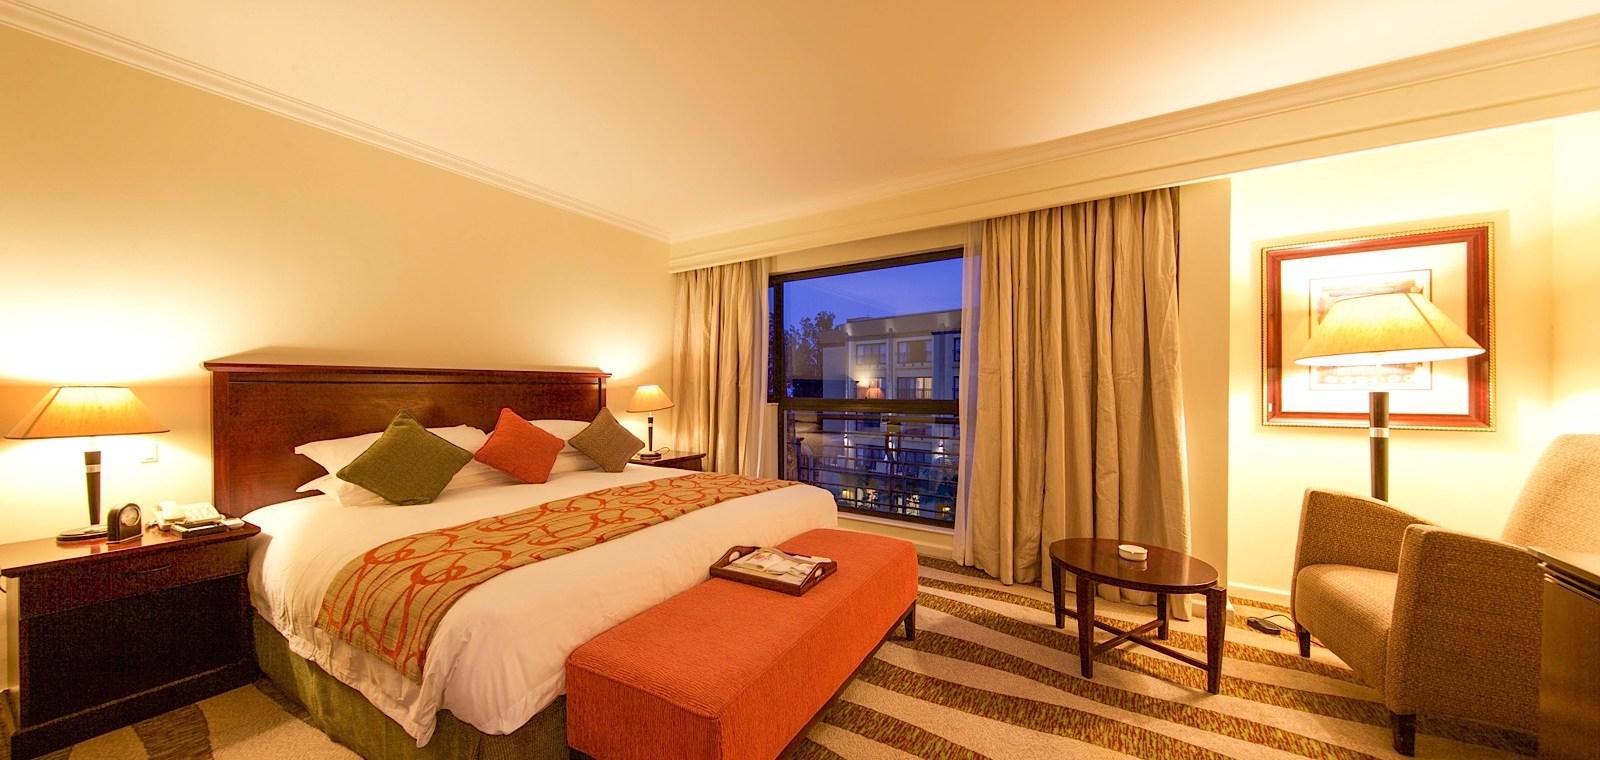 Deluxe_Room_kigali_serena